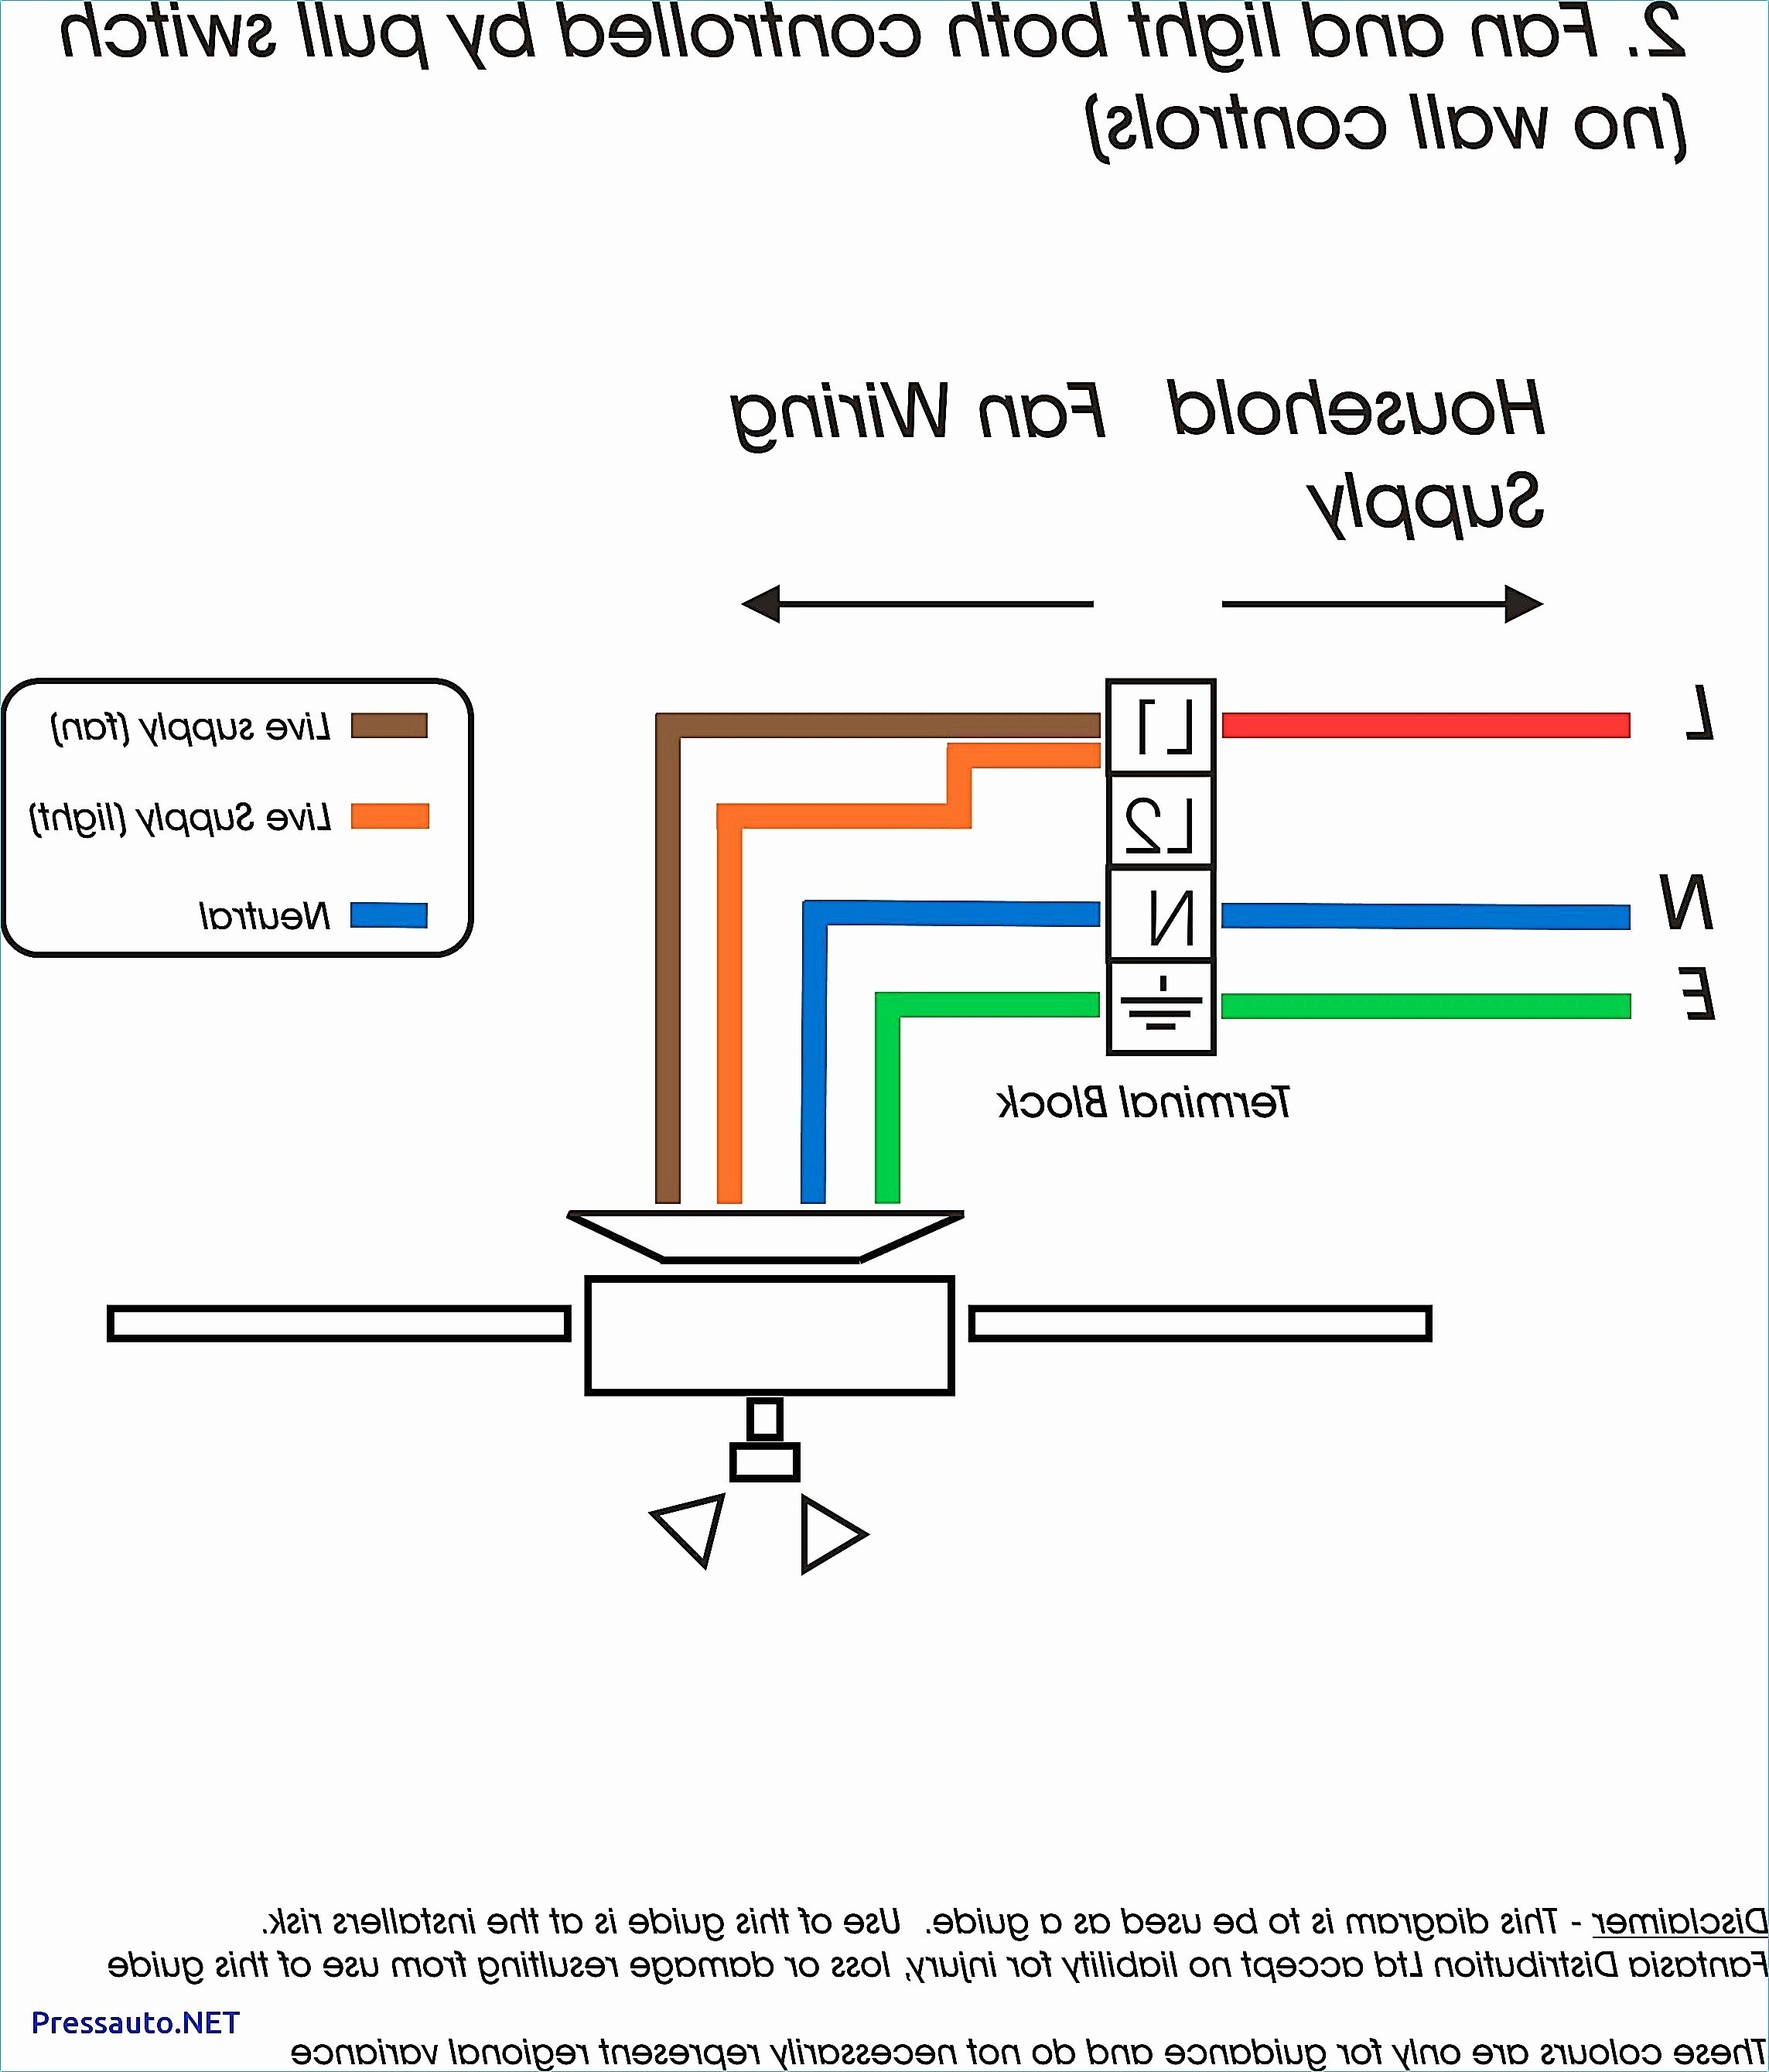 gpi fuel pump wiring diagram Download-Recessed Lighting Wiring Diagram Sample 17-g